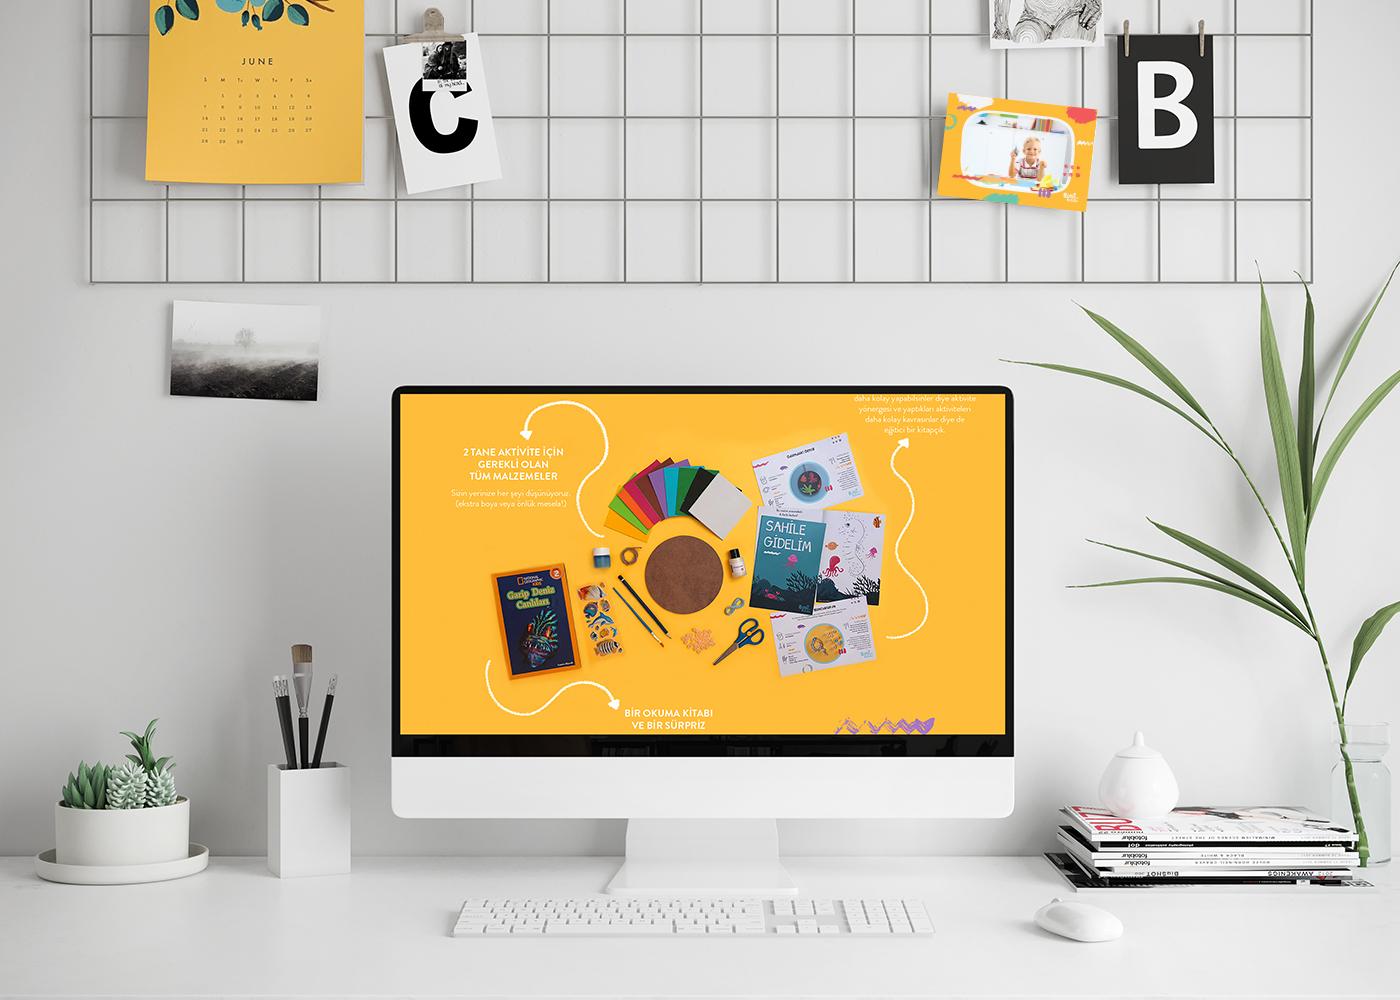 Brand Identity for Boni'nin Kutusu Activity Box / World Brand & Packaging Design Society